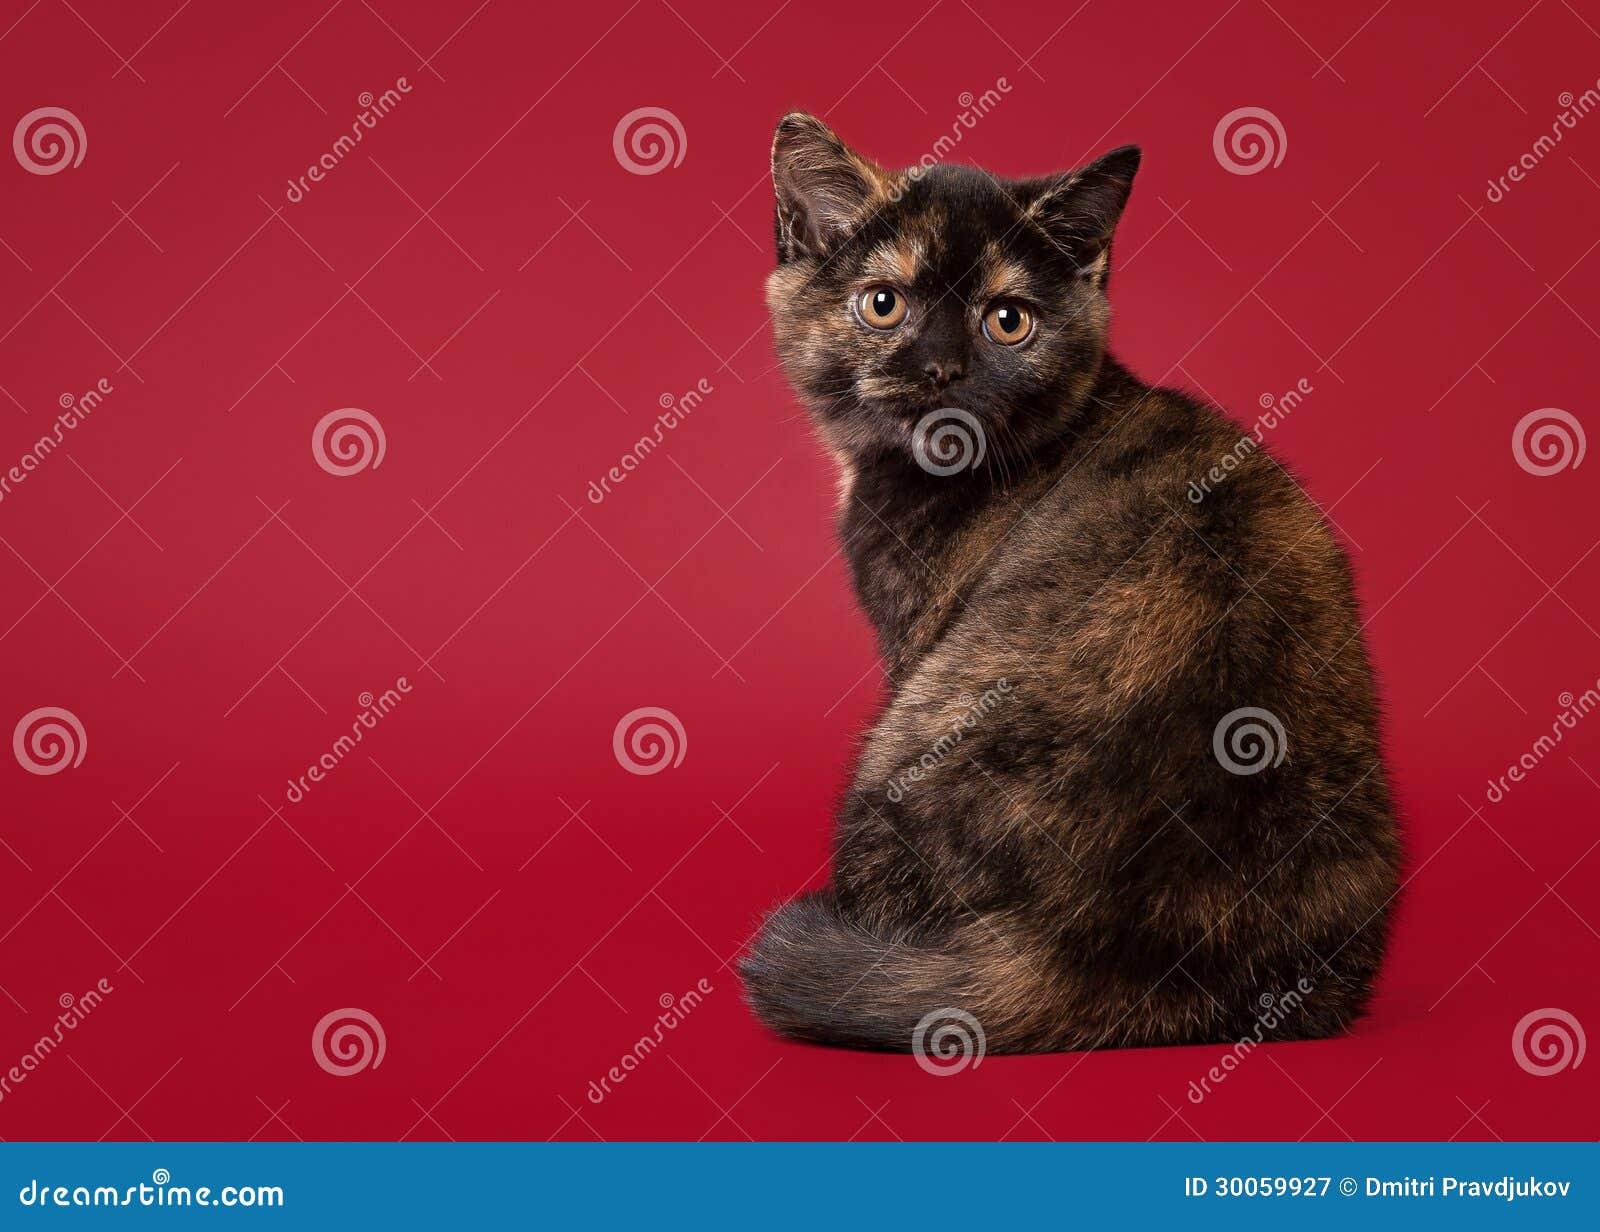 cat skin tag